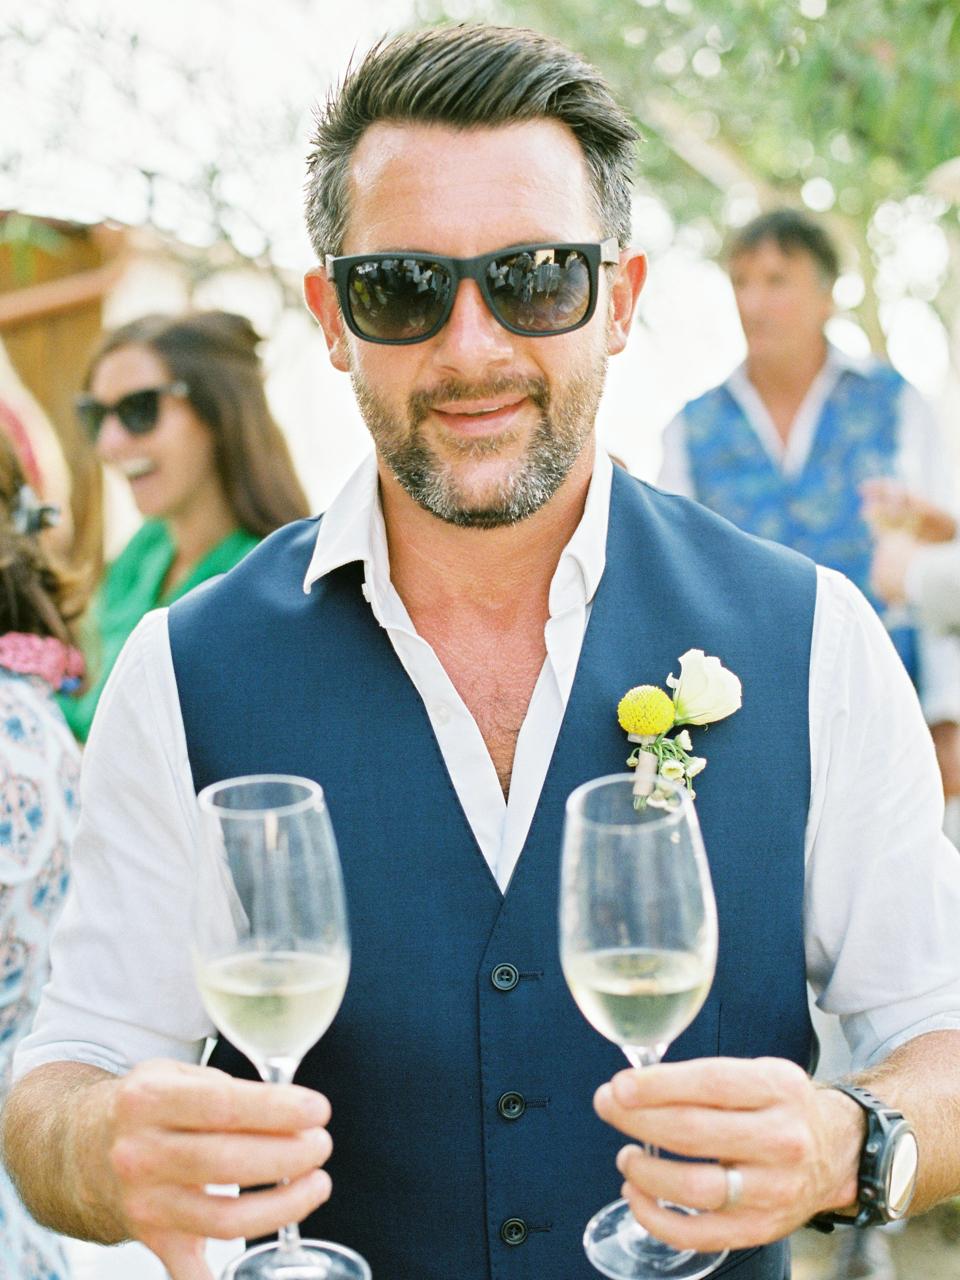 Sergio-Sorrentino-Fotografie_Il-Faro_Kelly-Wedding_0176.jpg